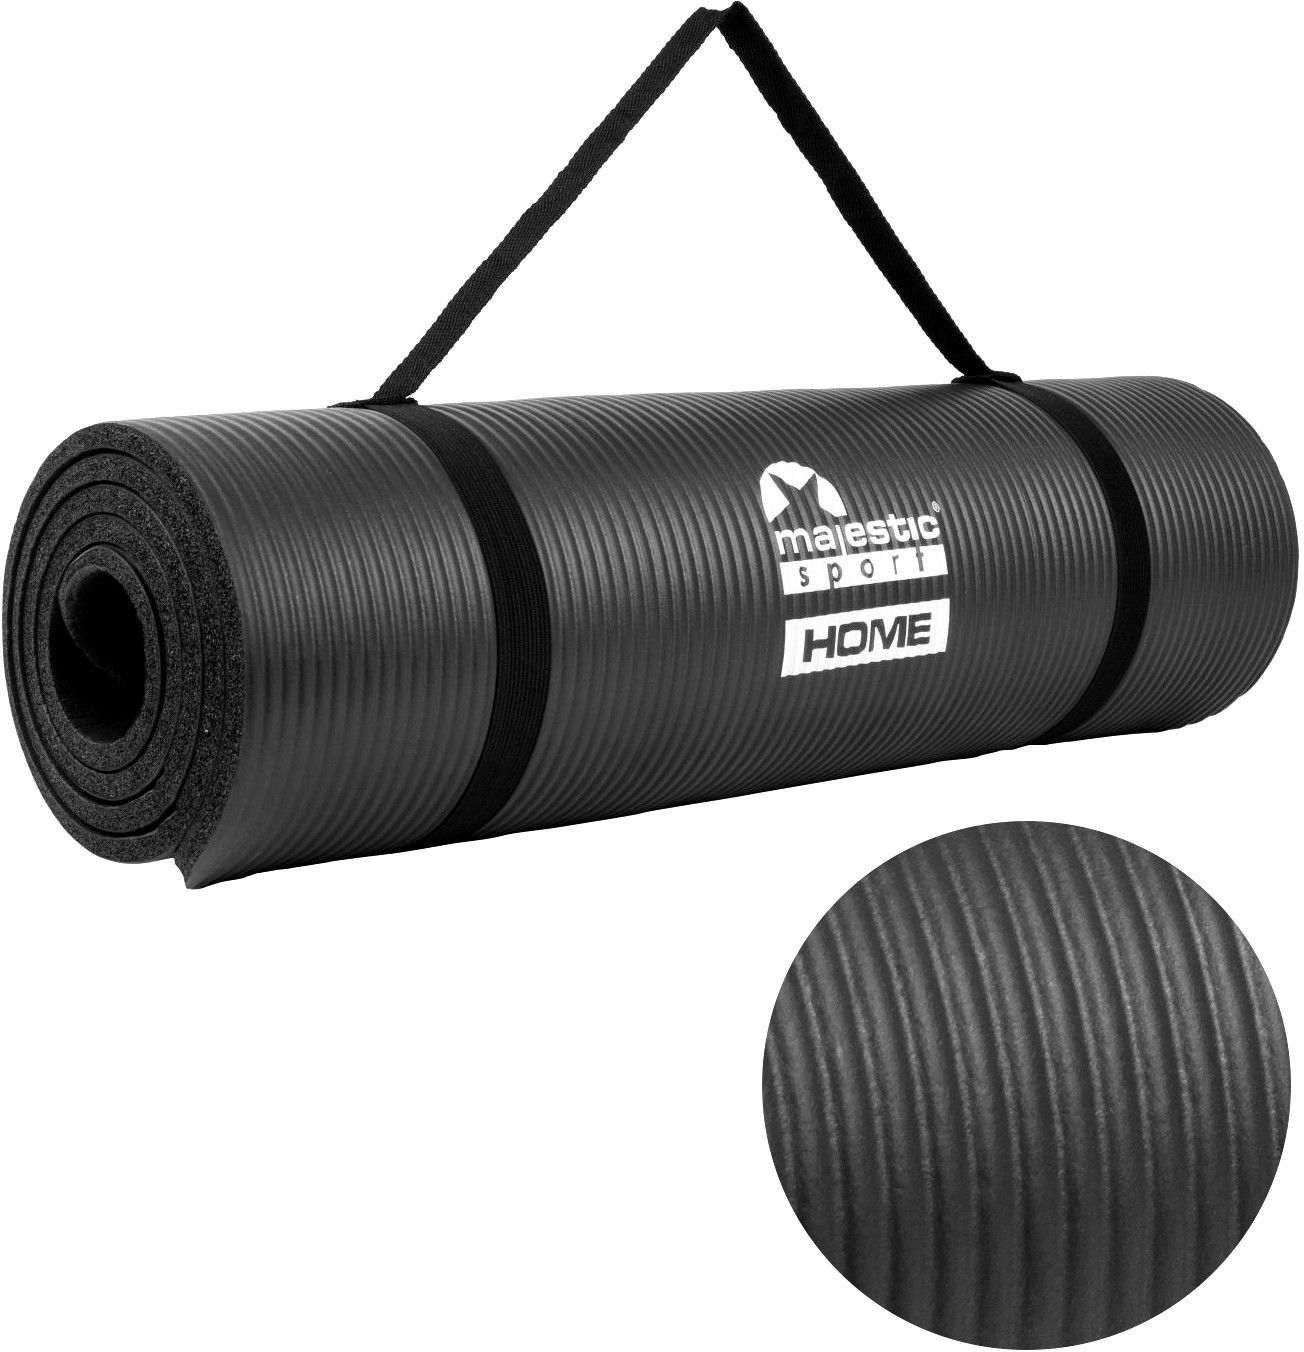 Mata do ćwiczeń NBR Majestic Sport HOME 185x60x1 cm czarna